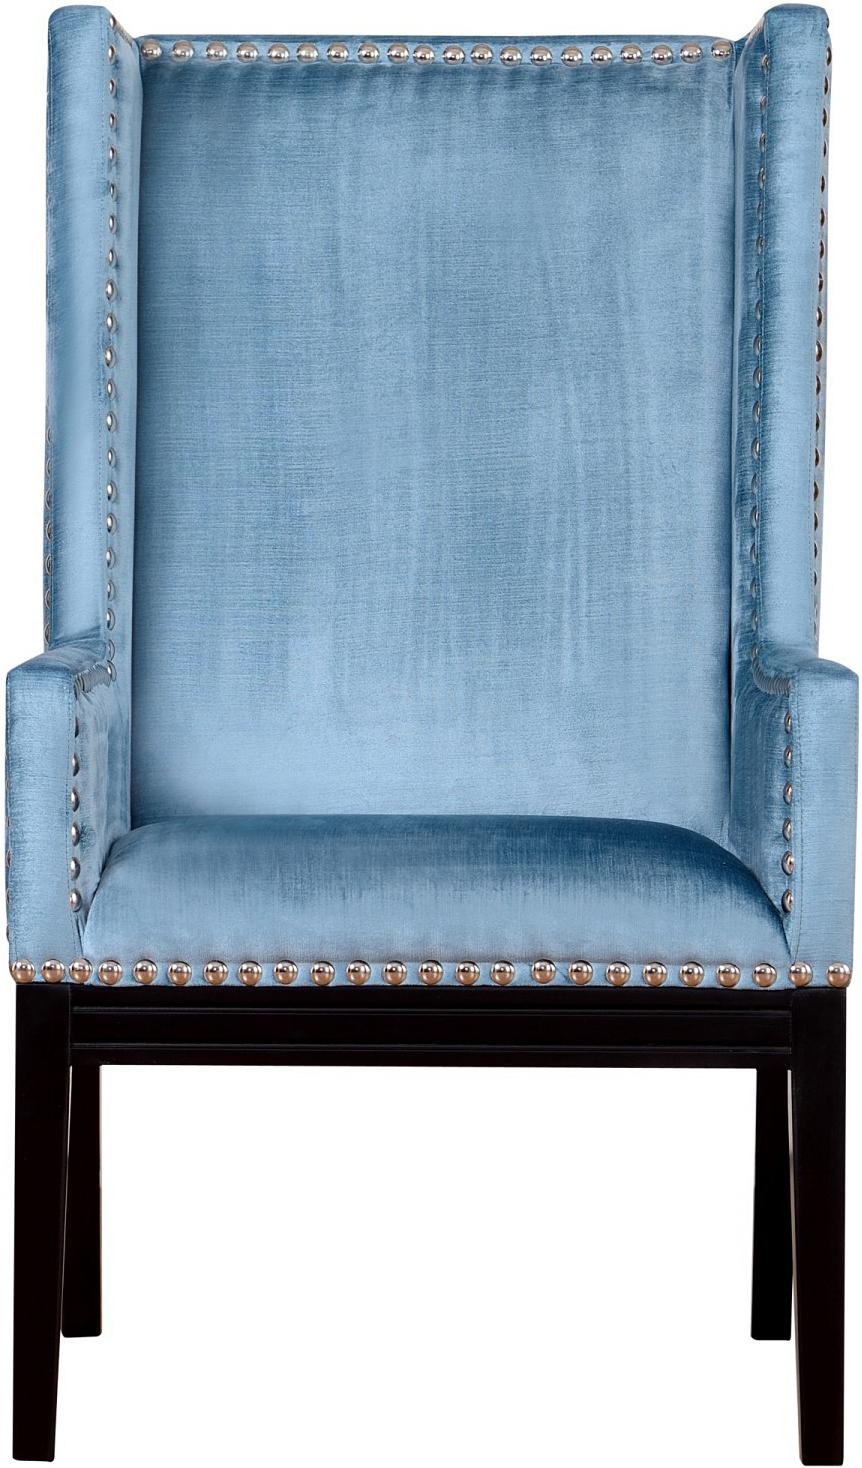 the velvet orianna arm chair in blue